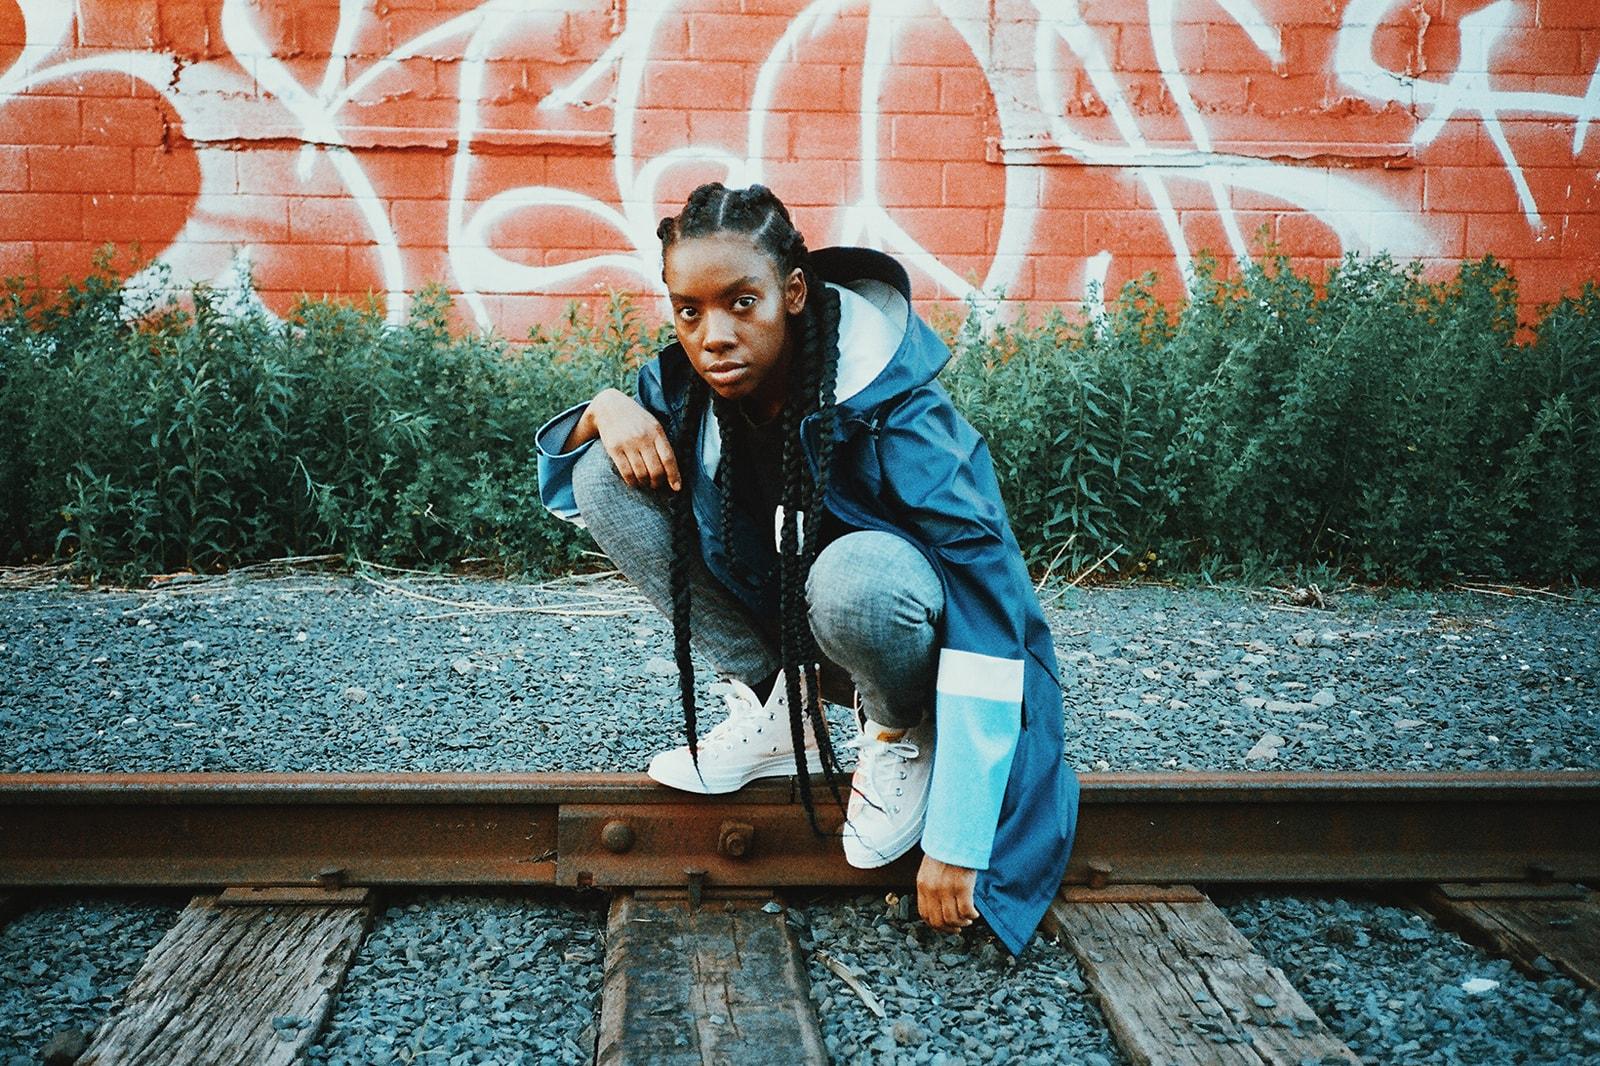 dua saleh rosetta album ep indie rock hip hop interview